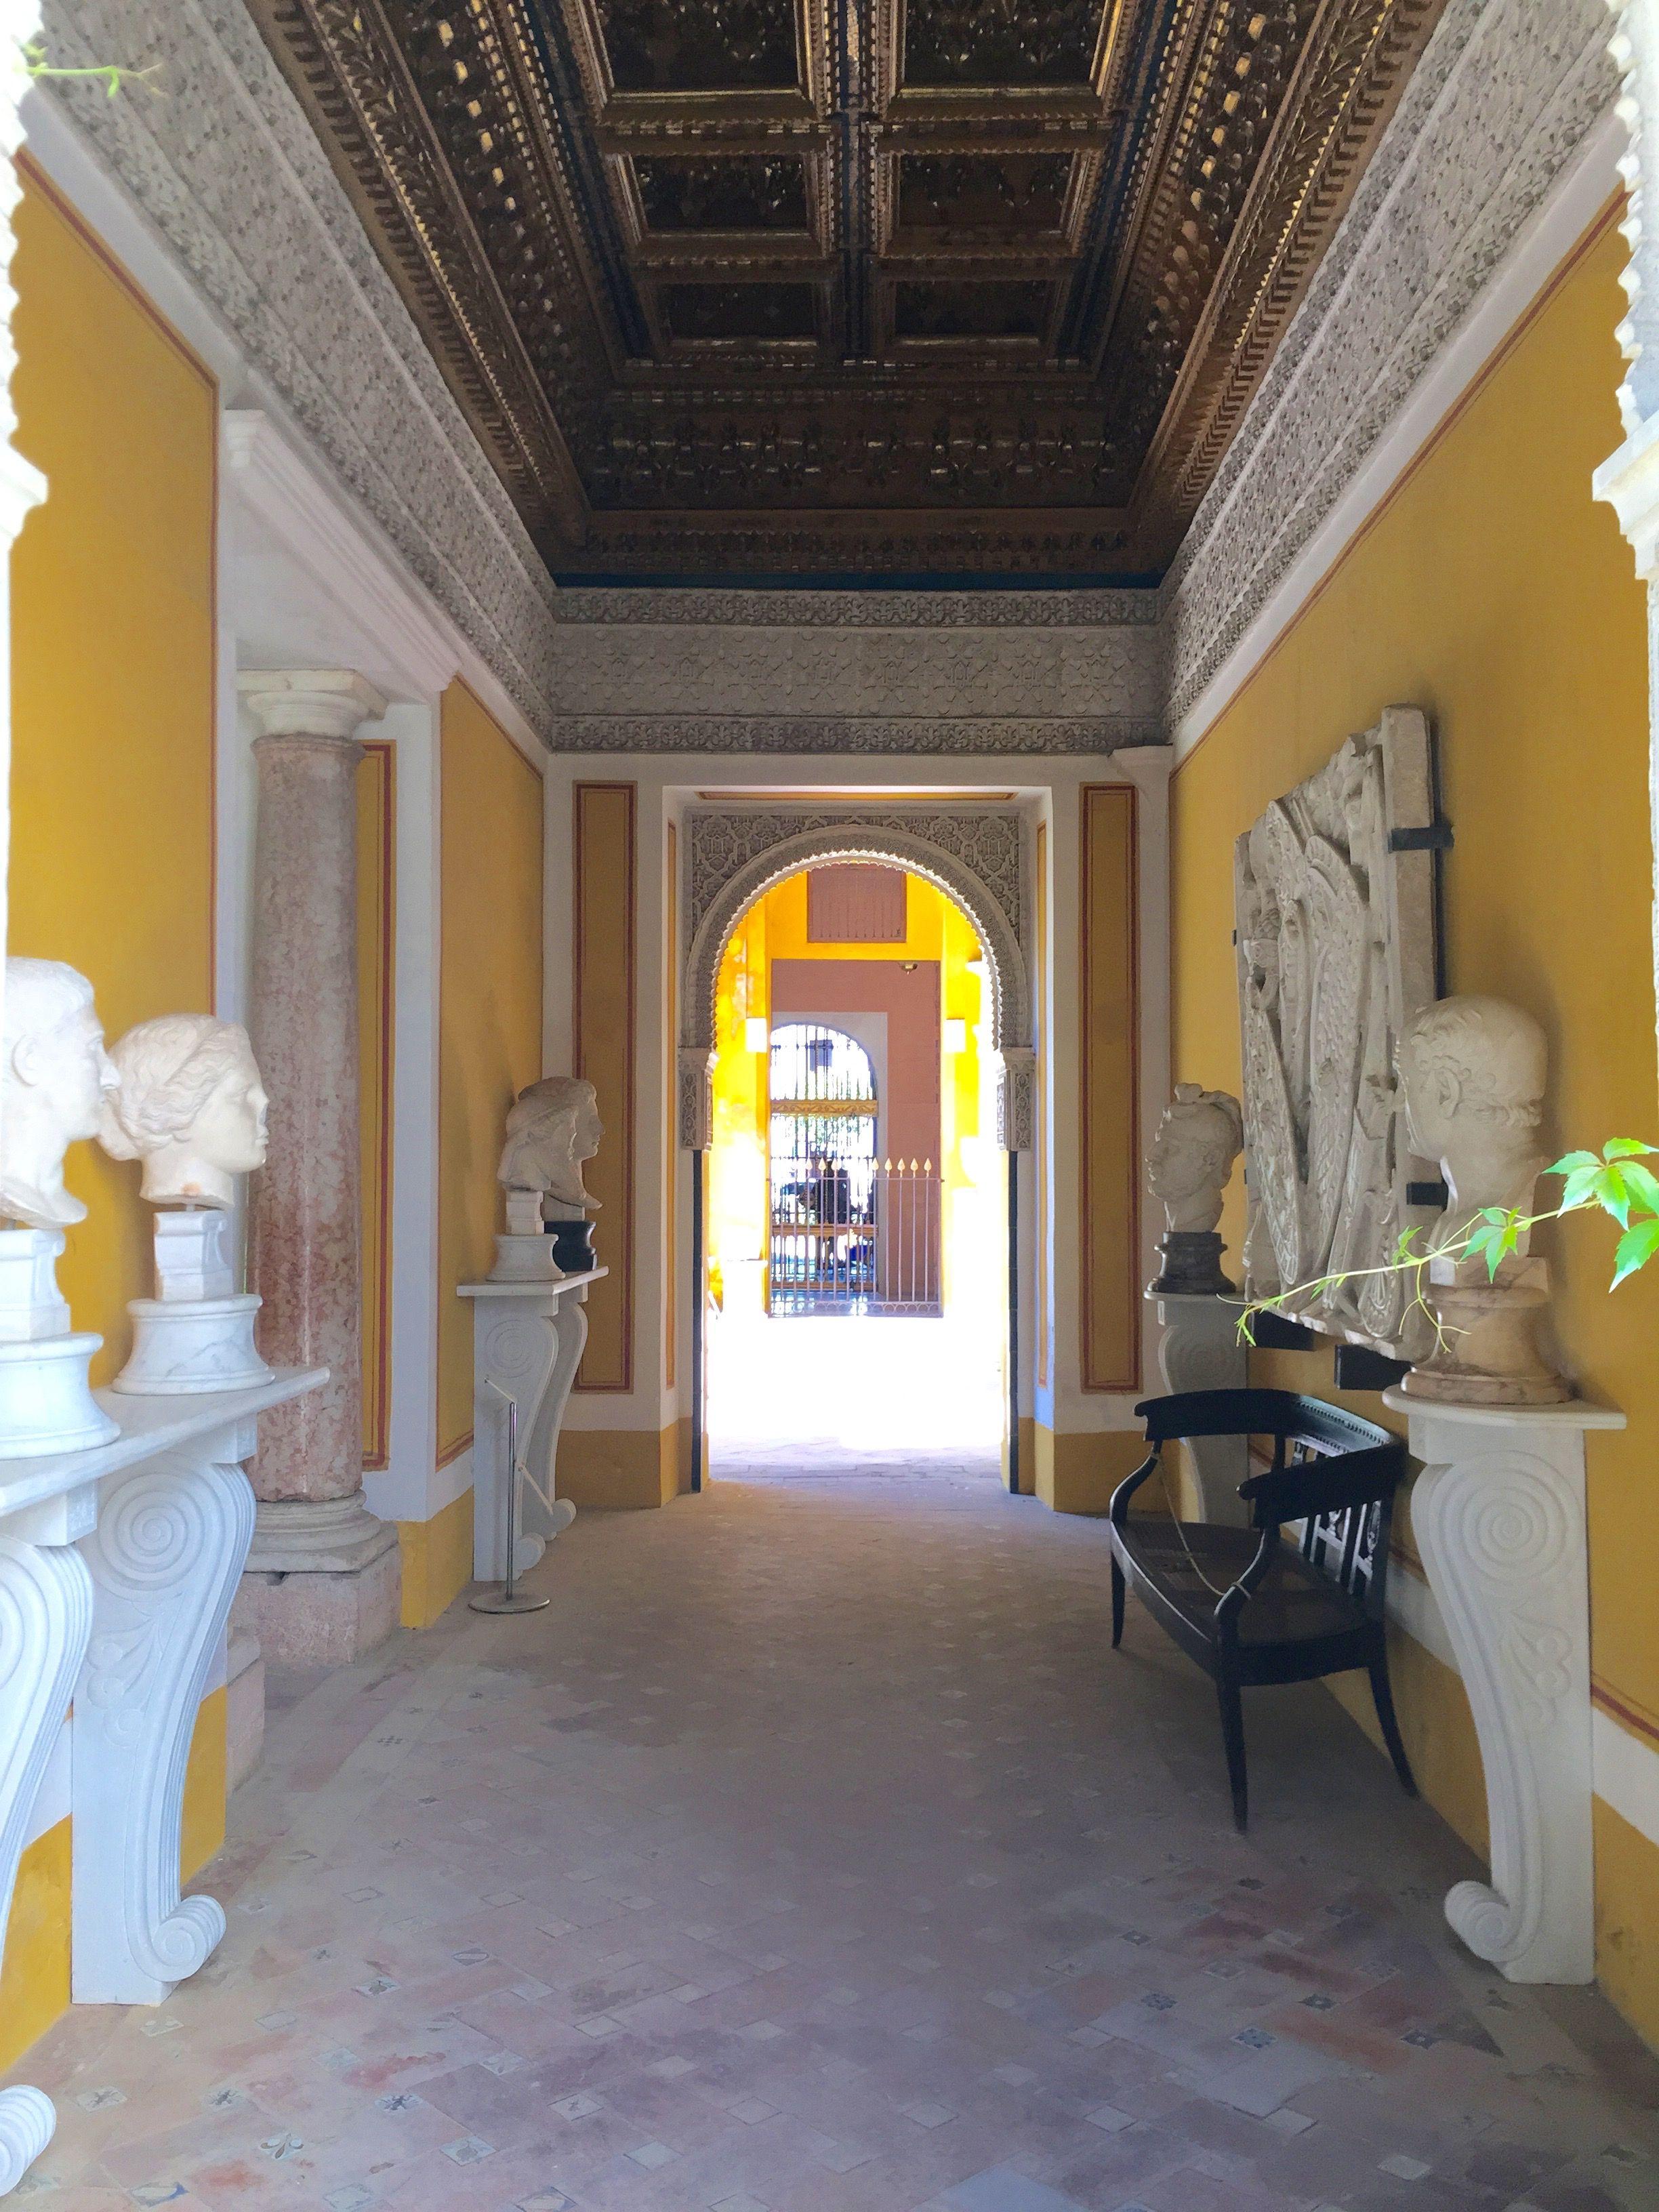 Casa Pilatos, Seville -- Photo by Cristopher Worthland